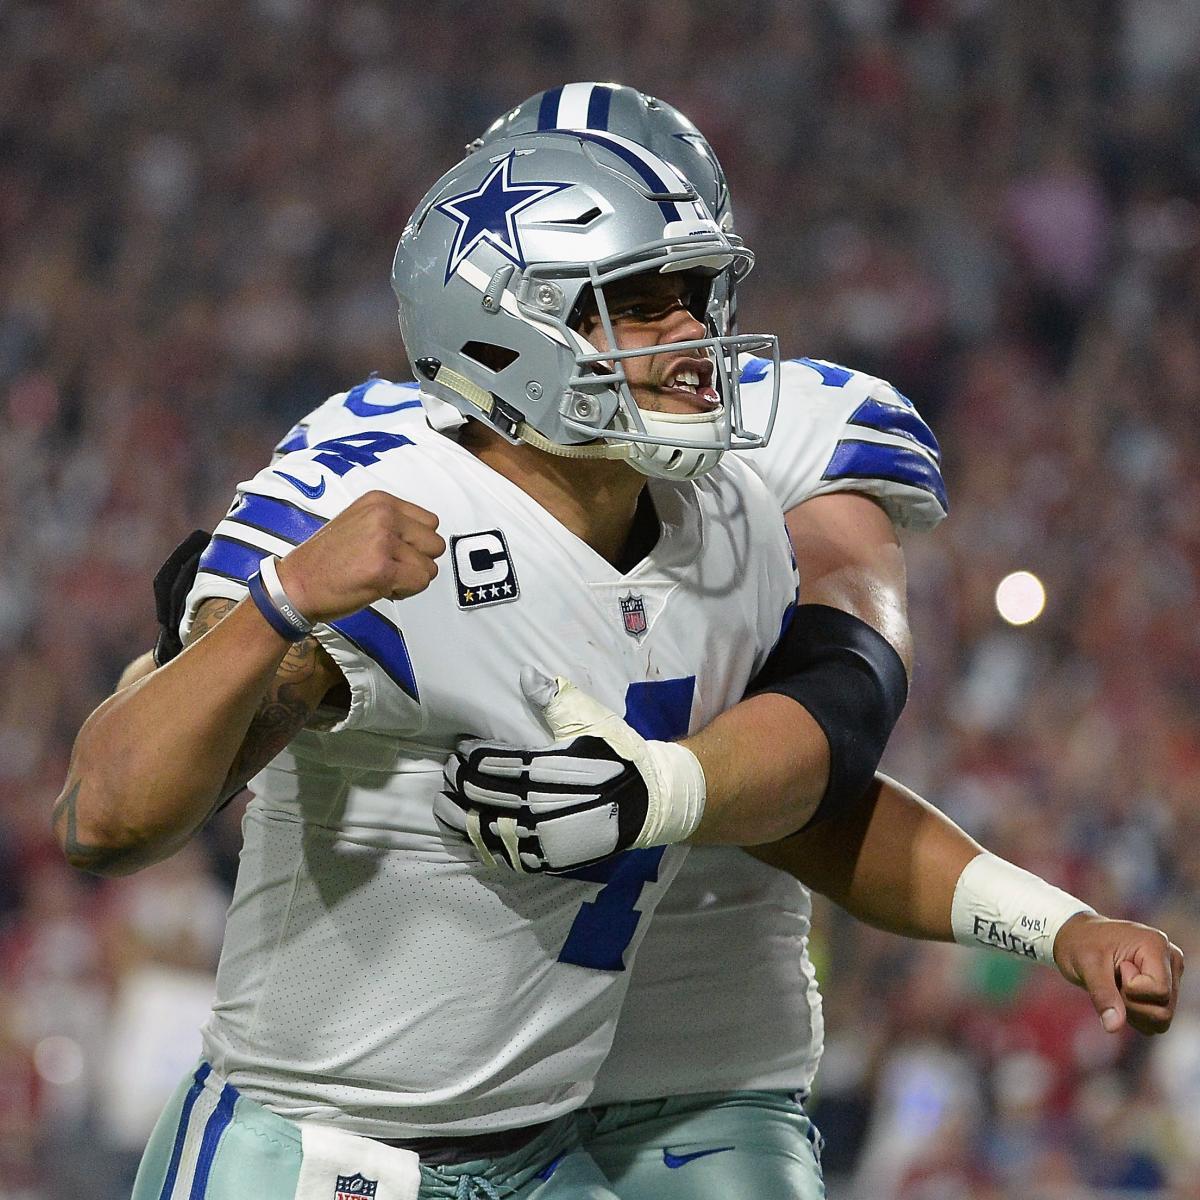 Dallas Cowboys Have Finally Broken Out of Early-Season Offensive Slump